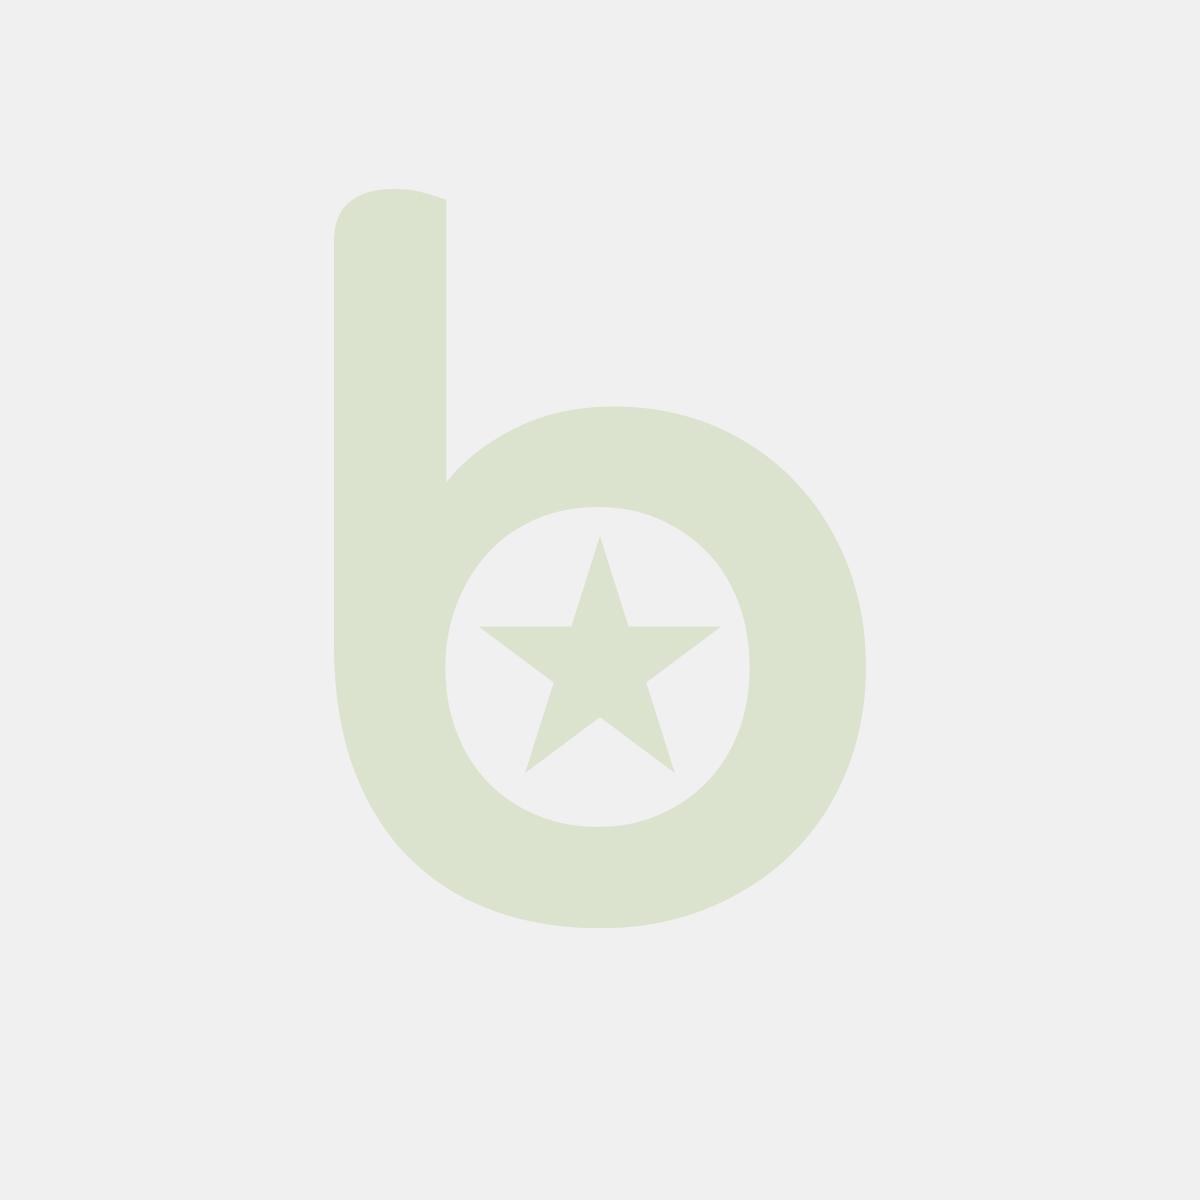 FINGERFOOD - pucharek PS biały 65ml 5,4x5,4x4,3 op. 25 sztuk